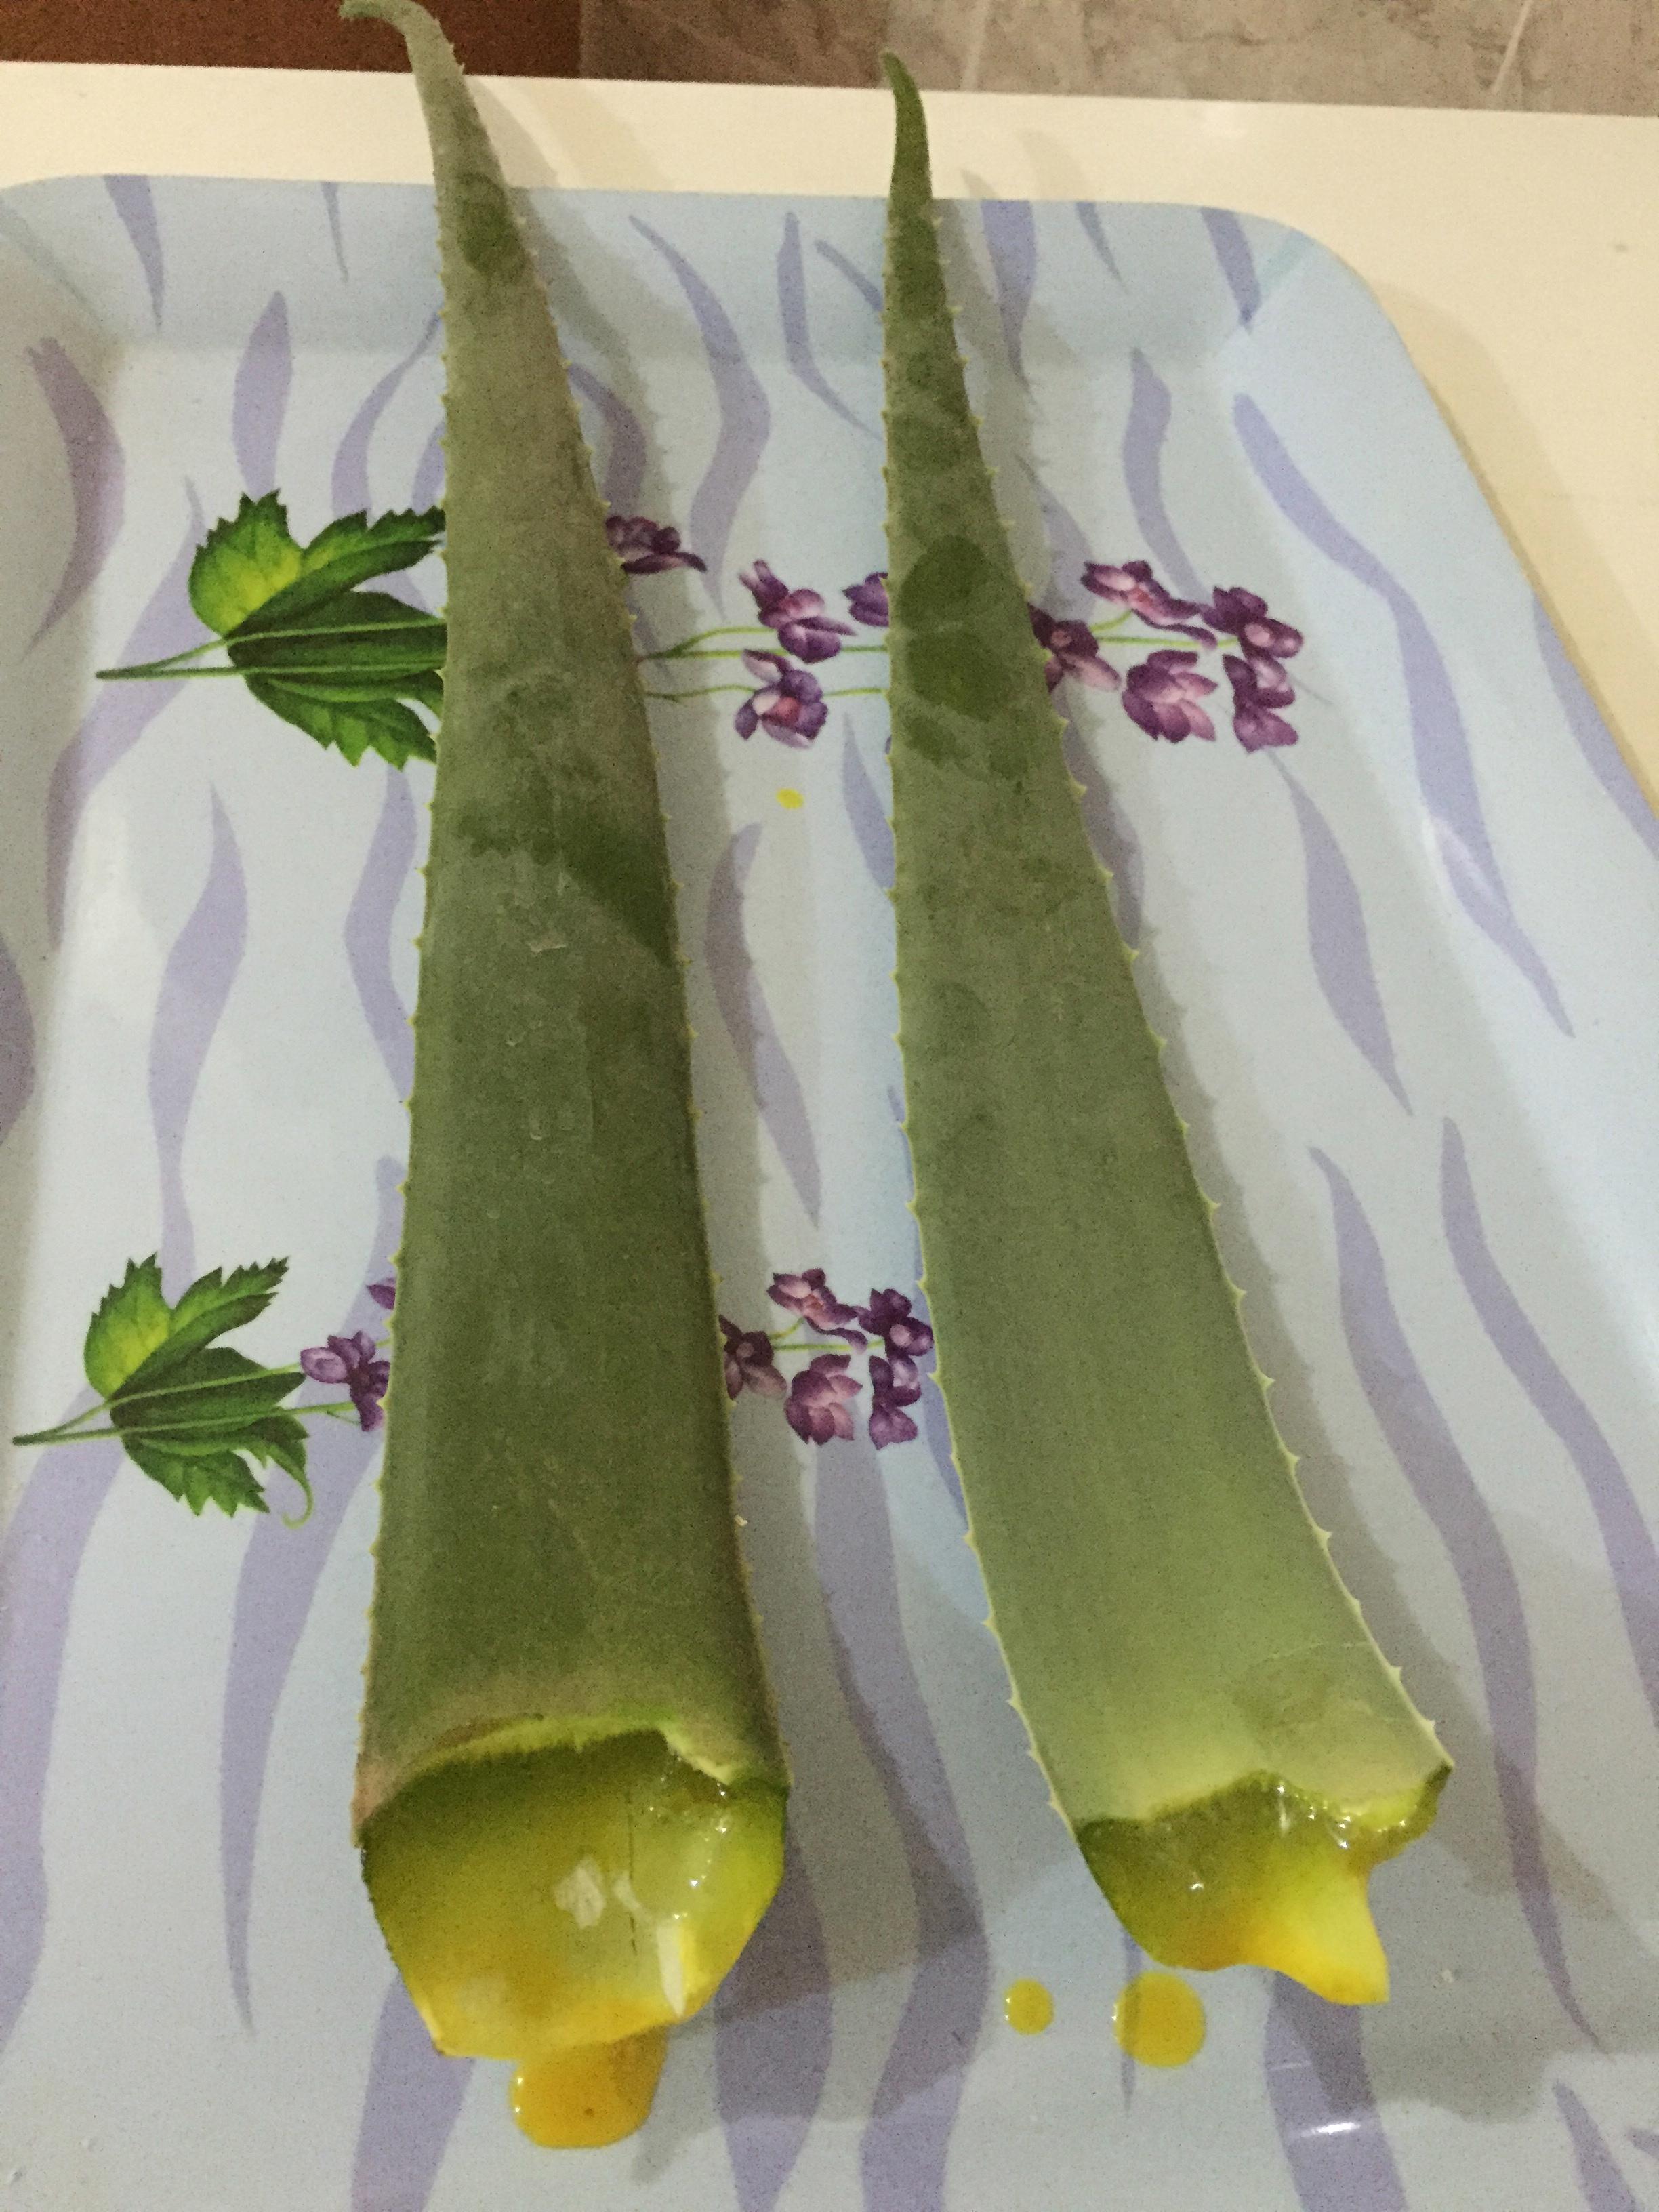 What Fresh Aloe Vera Good